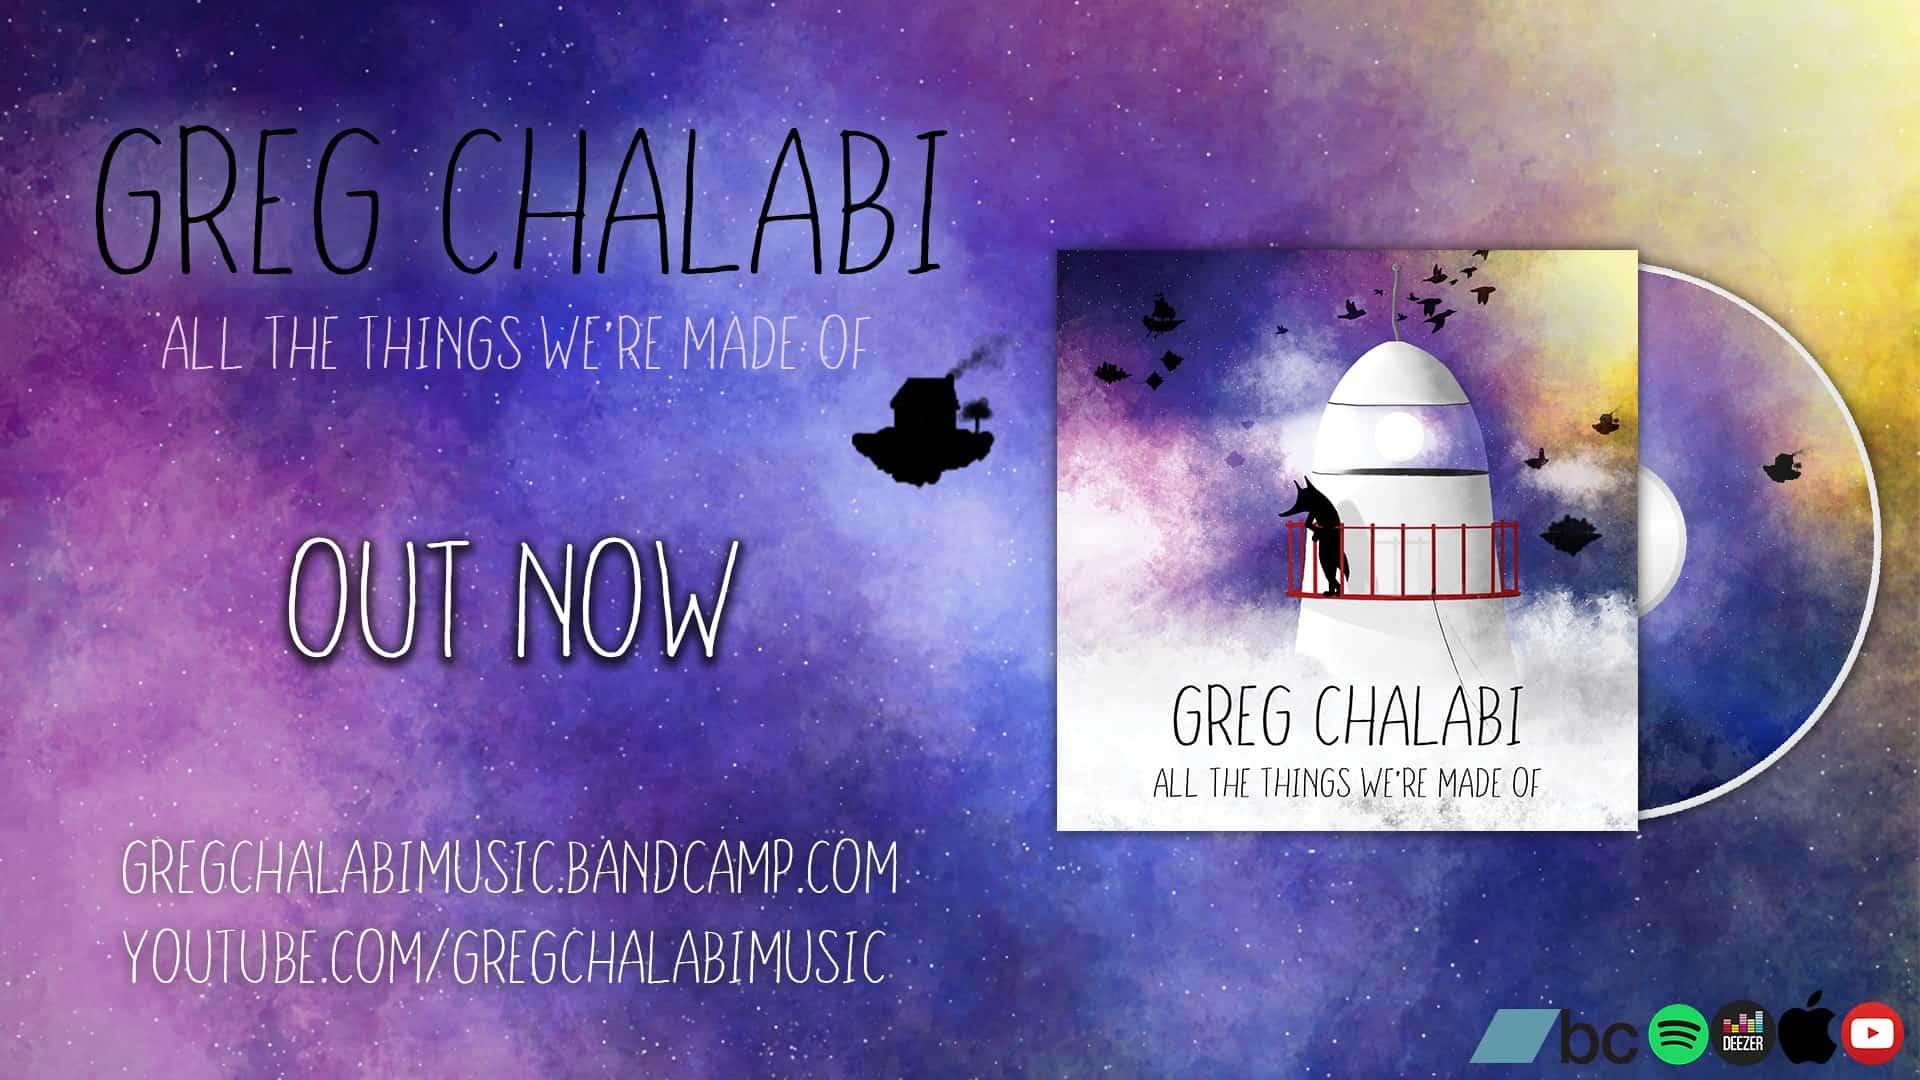 Greg Chalabi